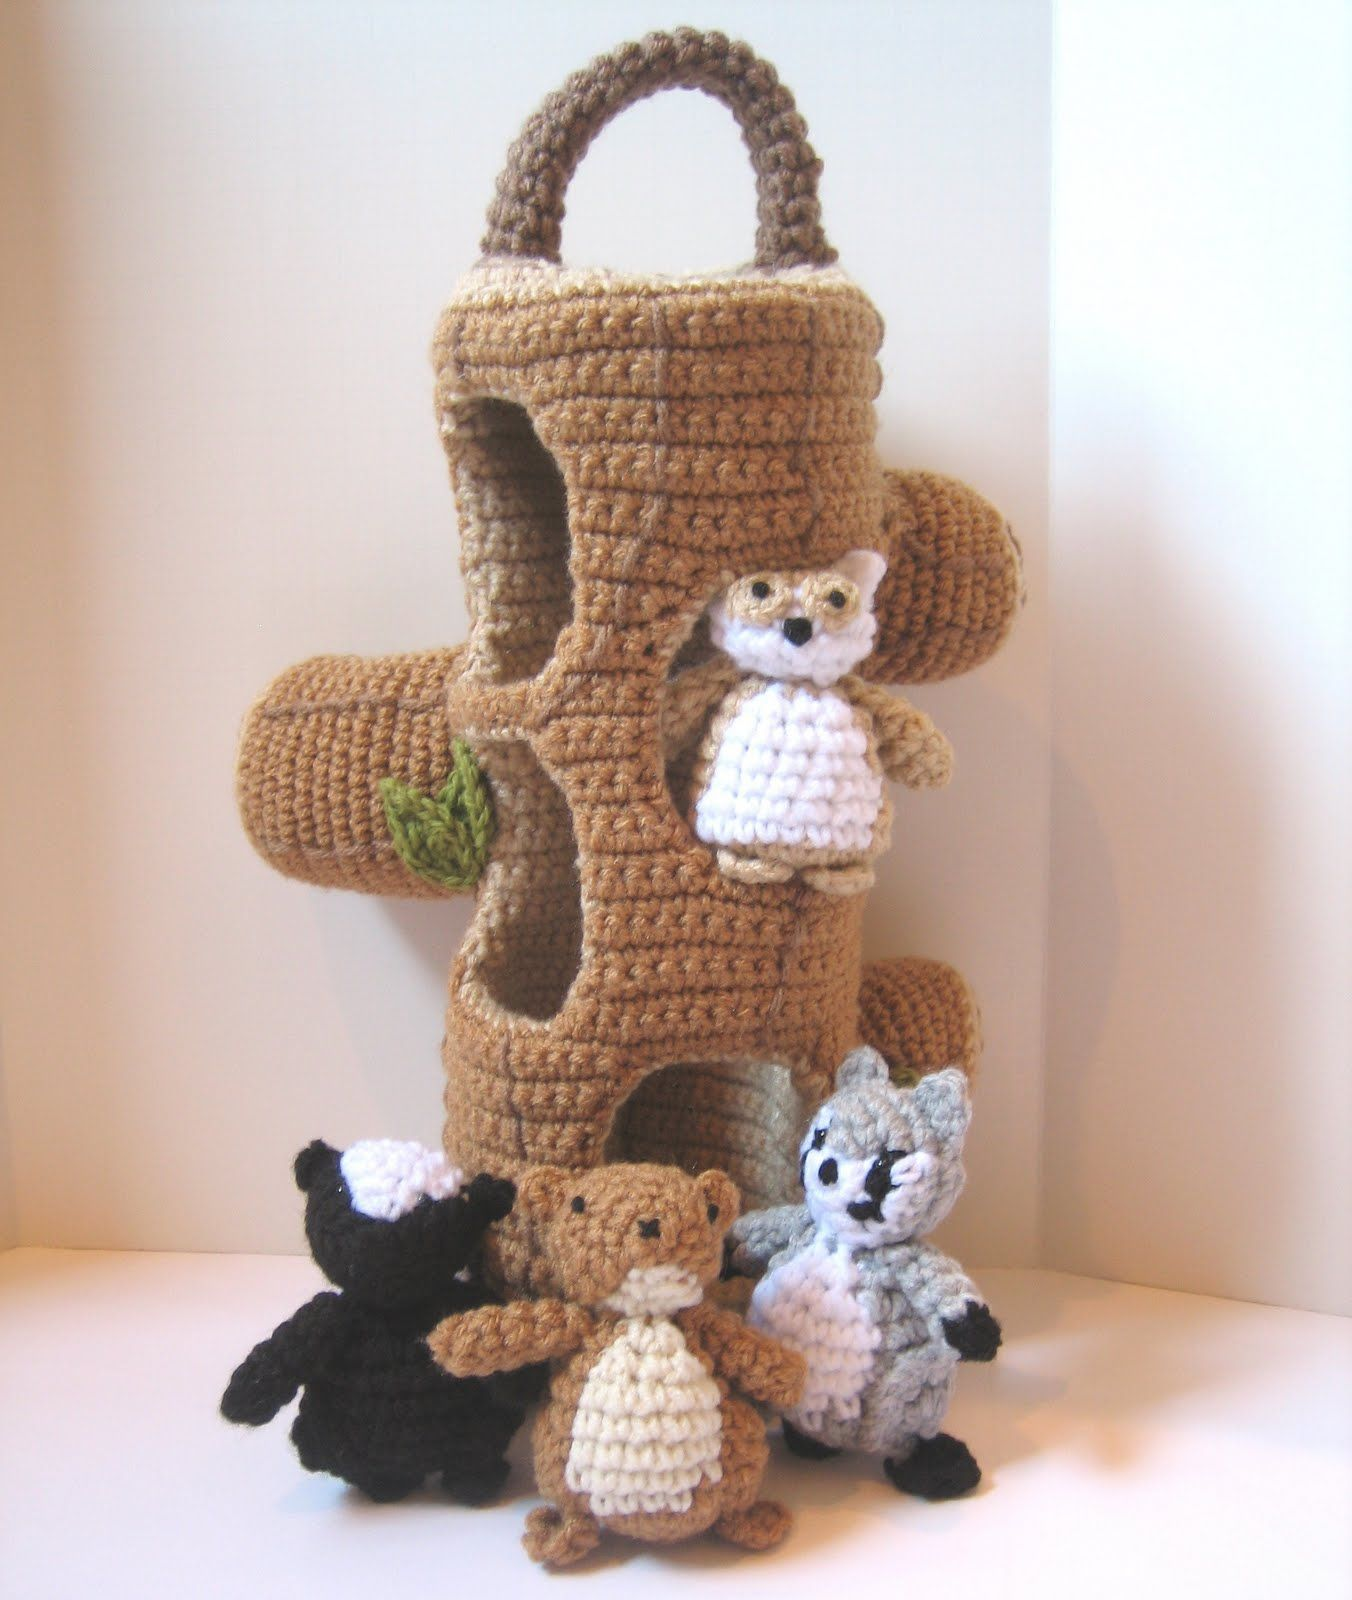 Newfreecrochetpatterns crochet n play designs new crochet newfreecrochetpatterns crochet n play designs new crochet pattern bankloansurffo Images